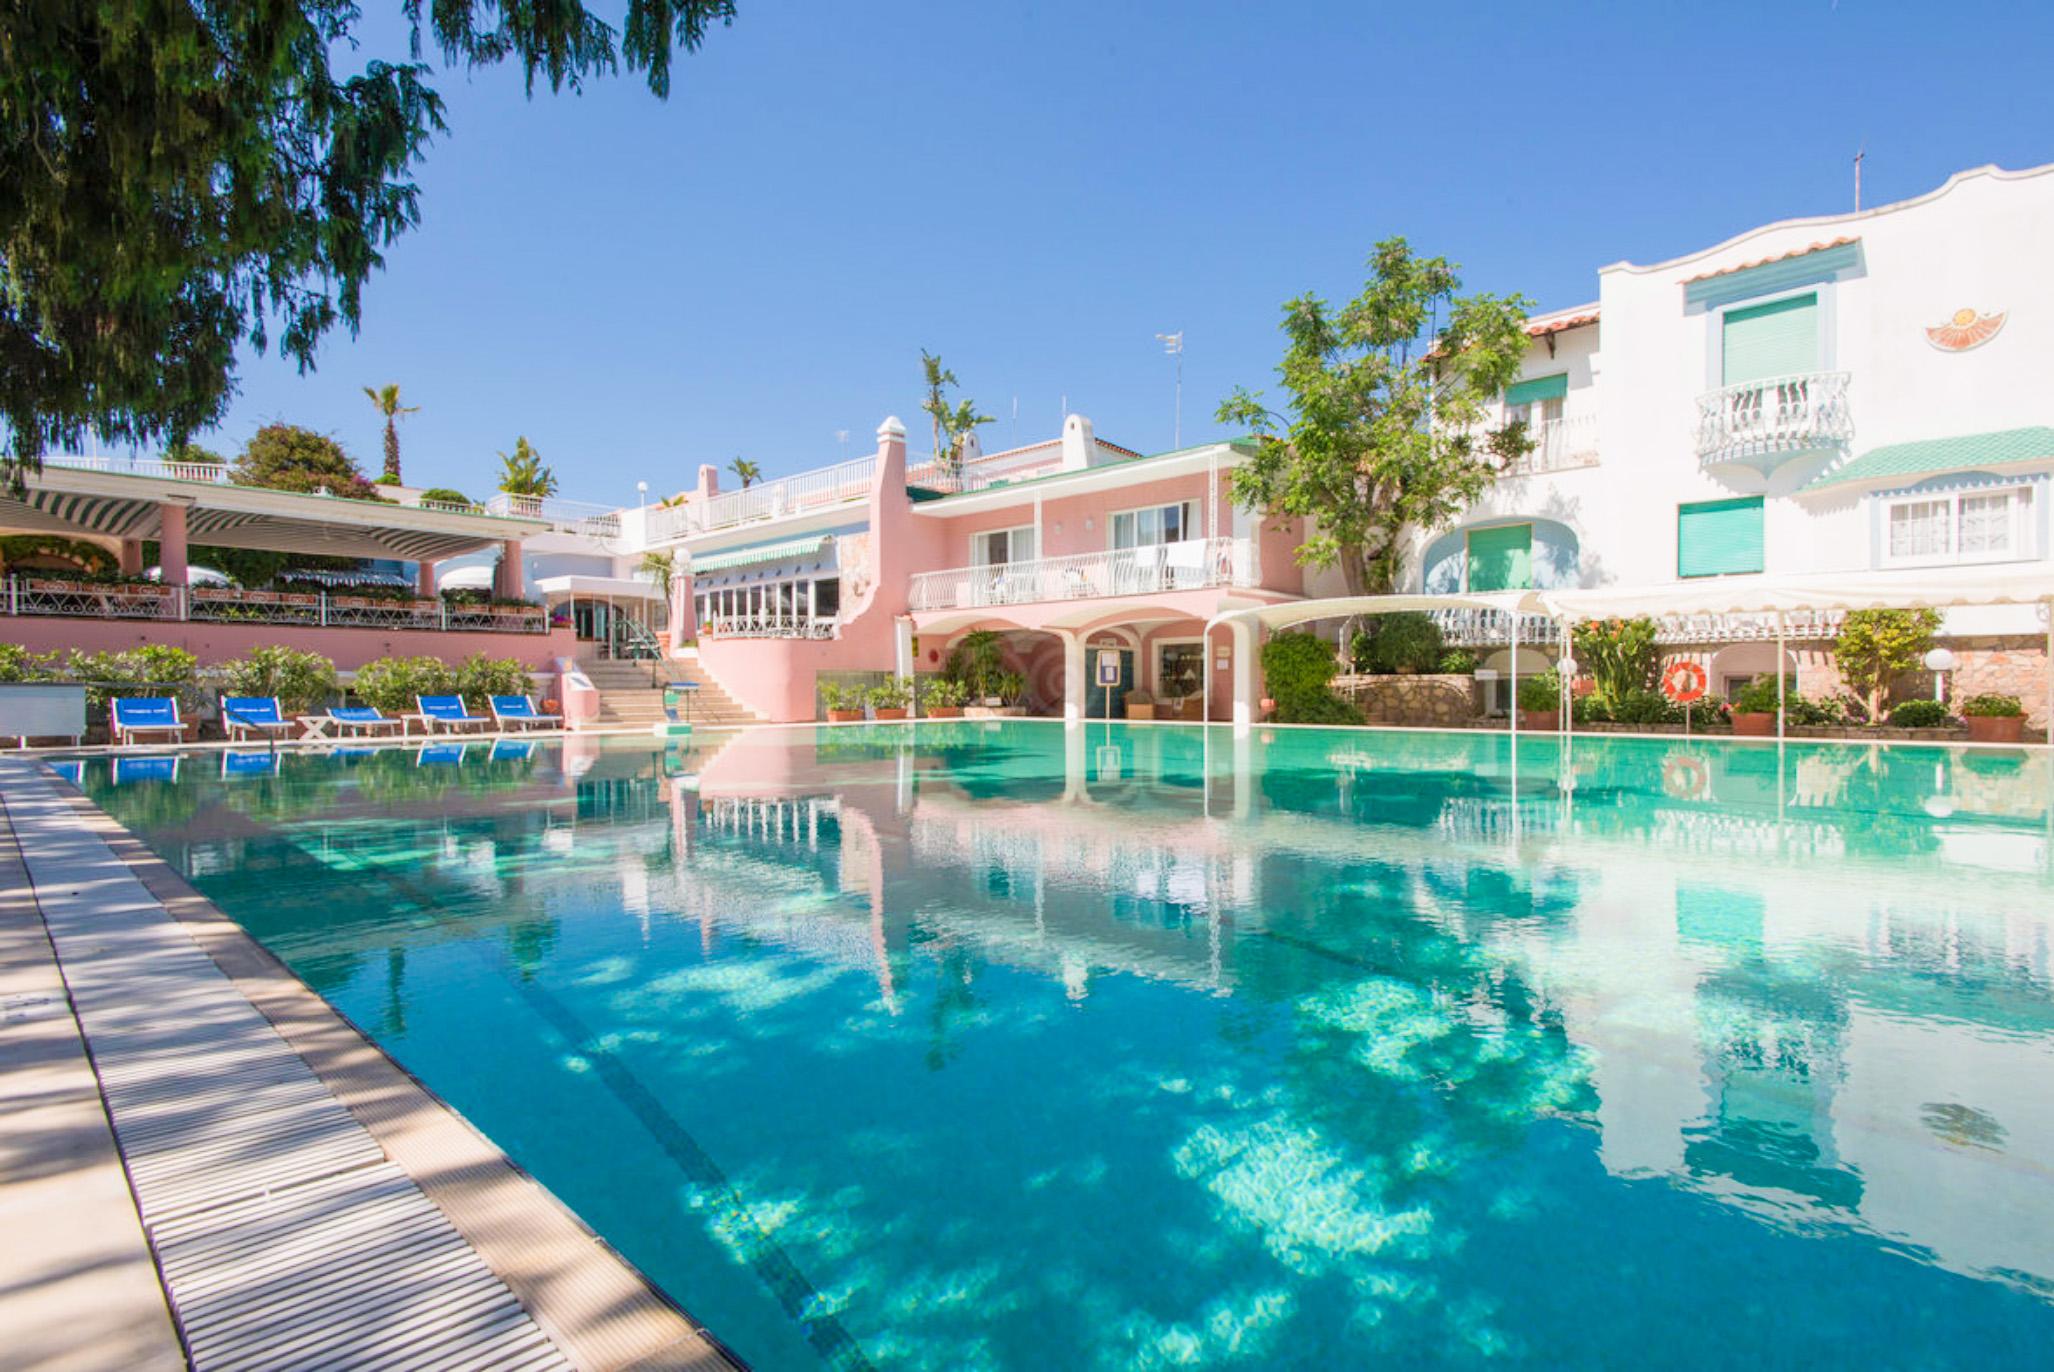 hotel-continental-terme-ischia-piscina-esterna2